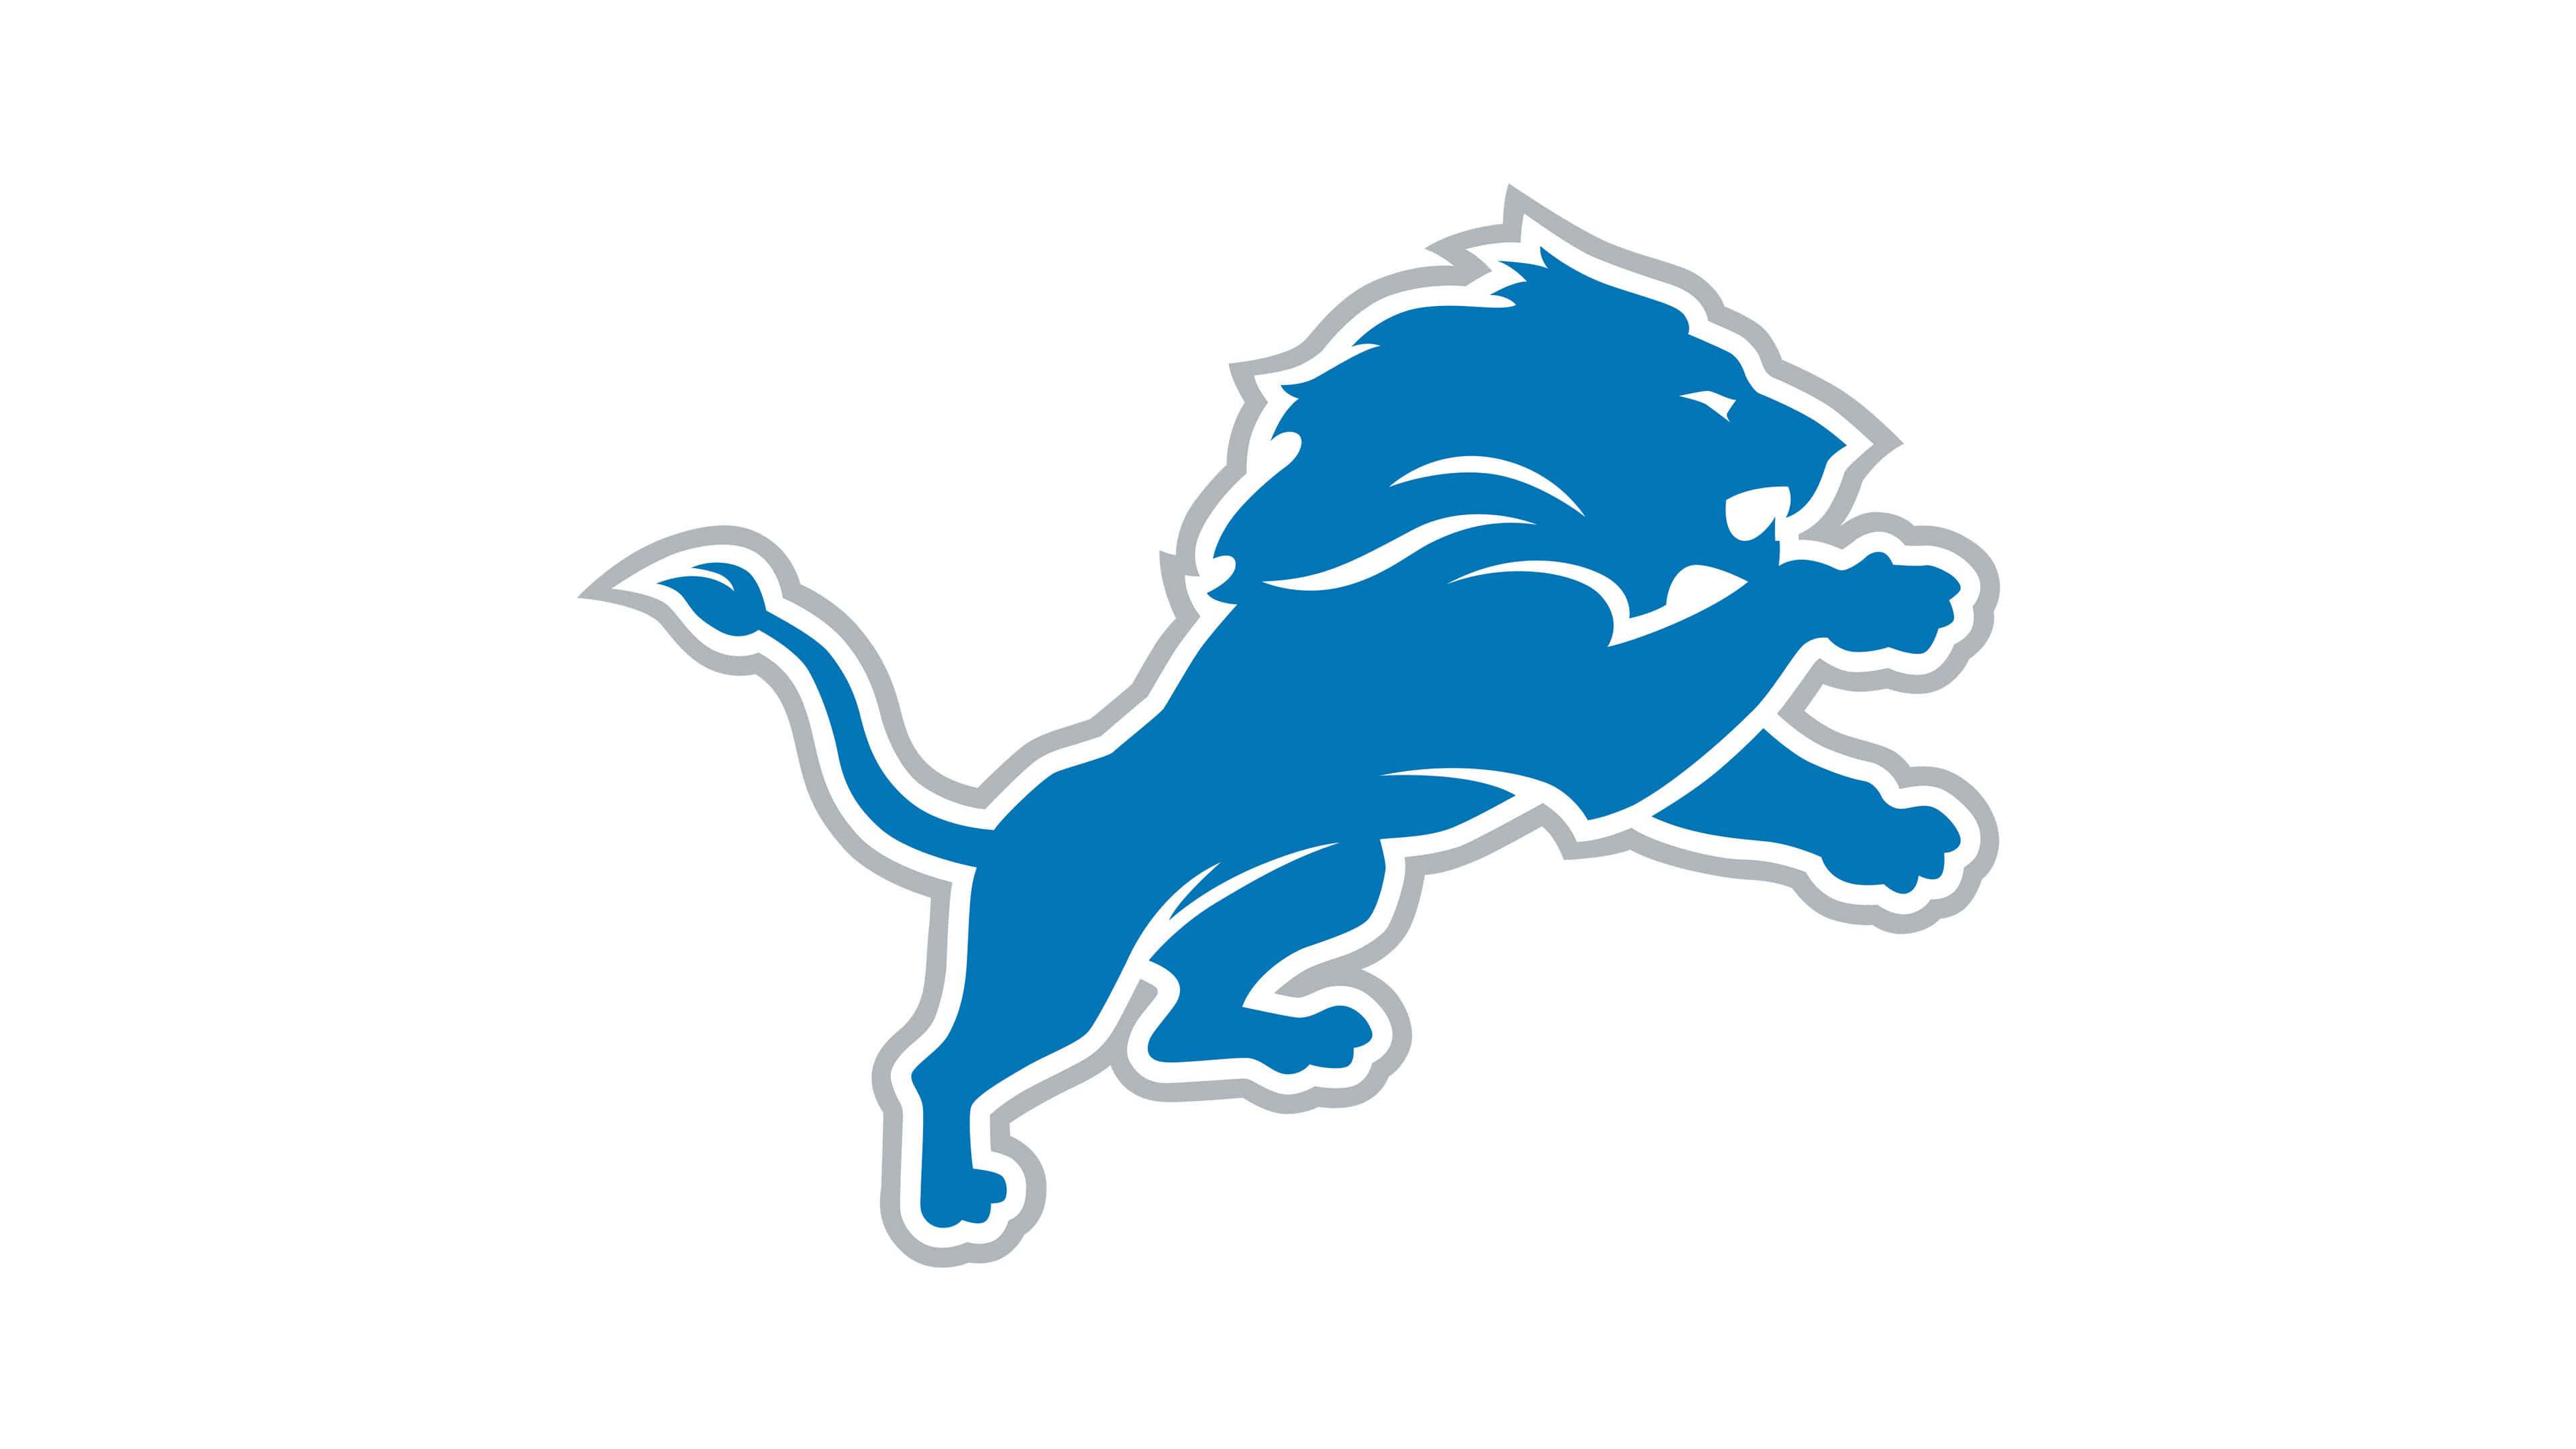 Detroit Lions Nfl Logo Uhd 4k Wallpaper Detroit Lions 3840x2160 Wallpaper Teahub Io